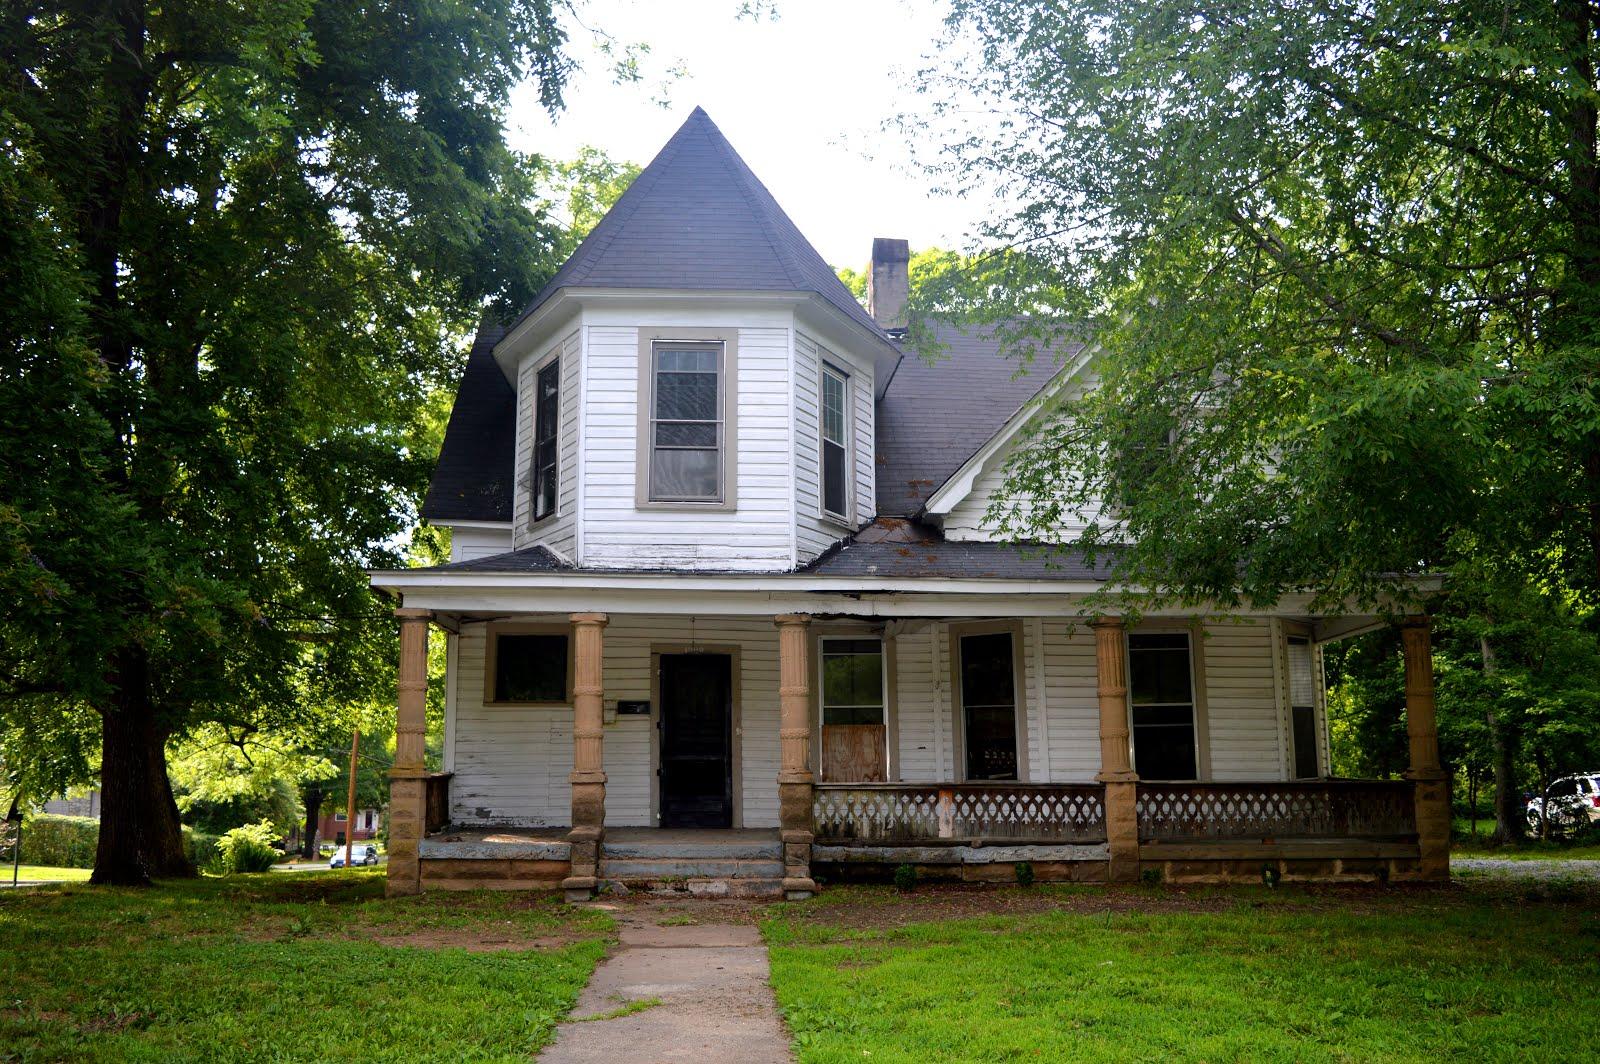 1008 N. Main Street, Salisbury NC ~ circa 1900 ~ $27,500